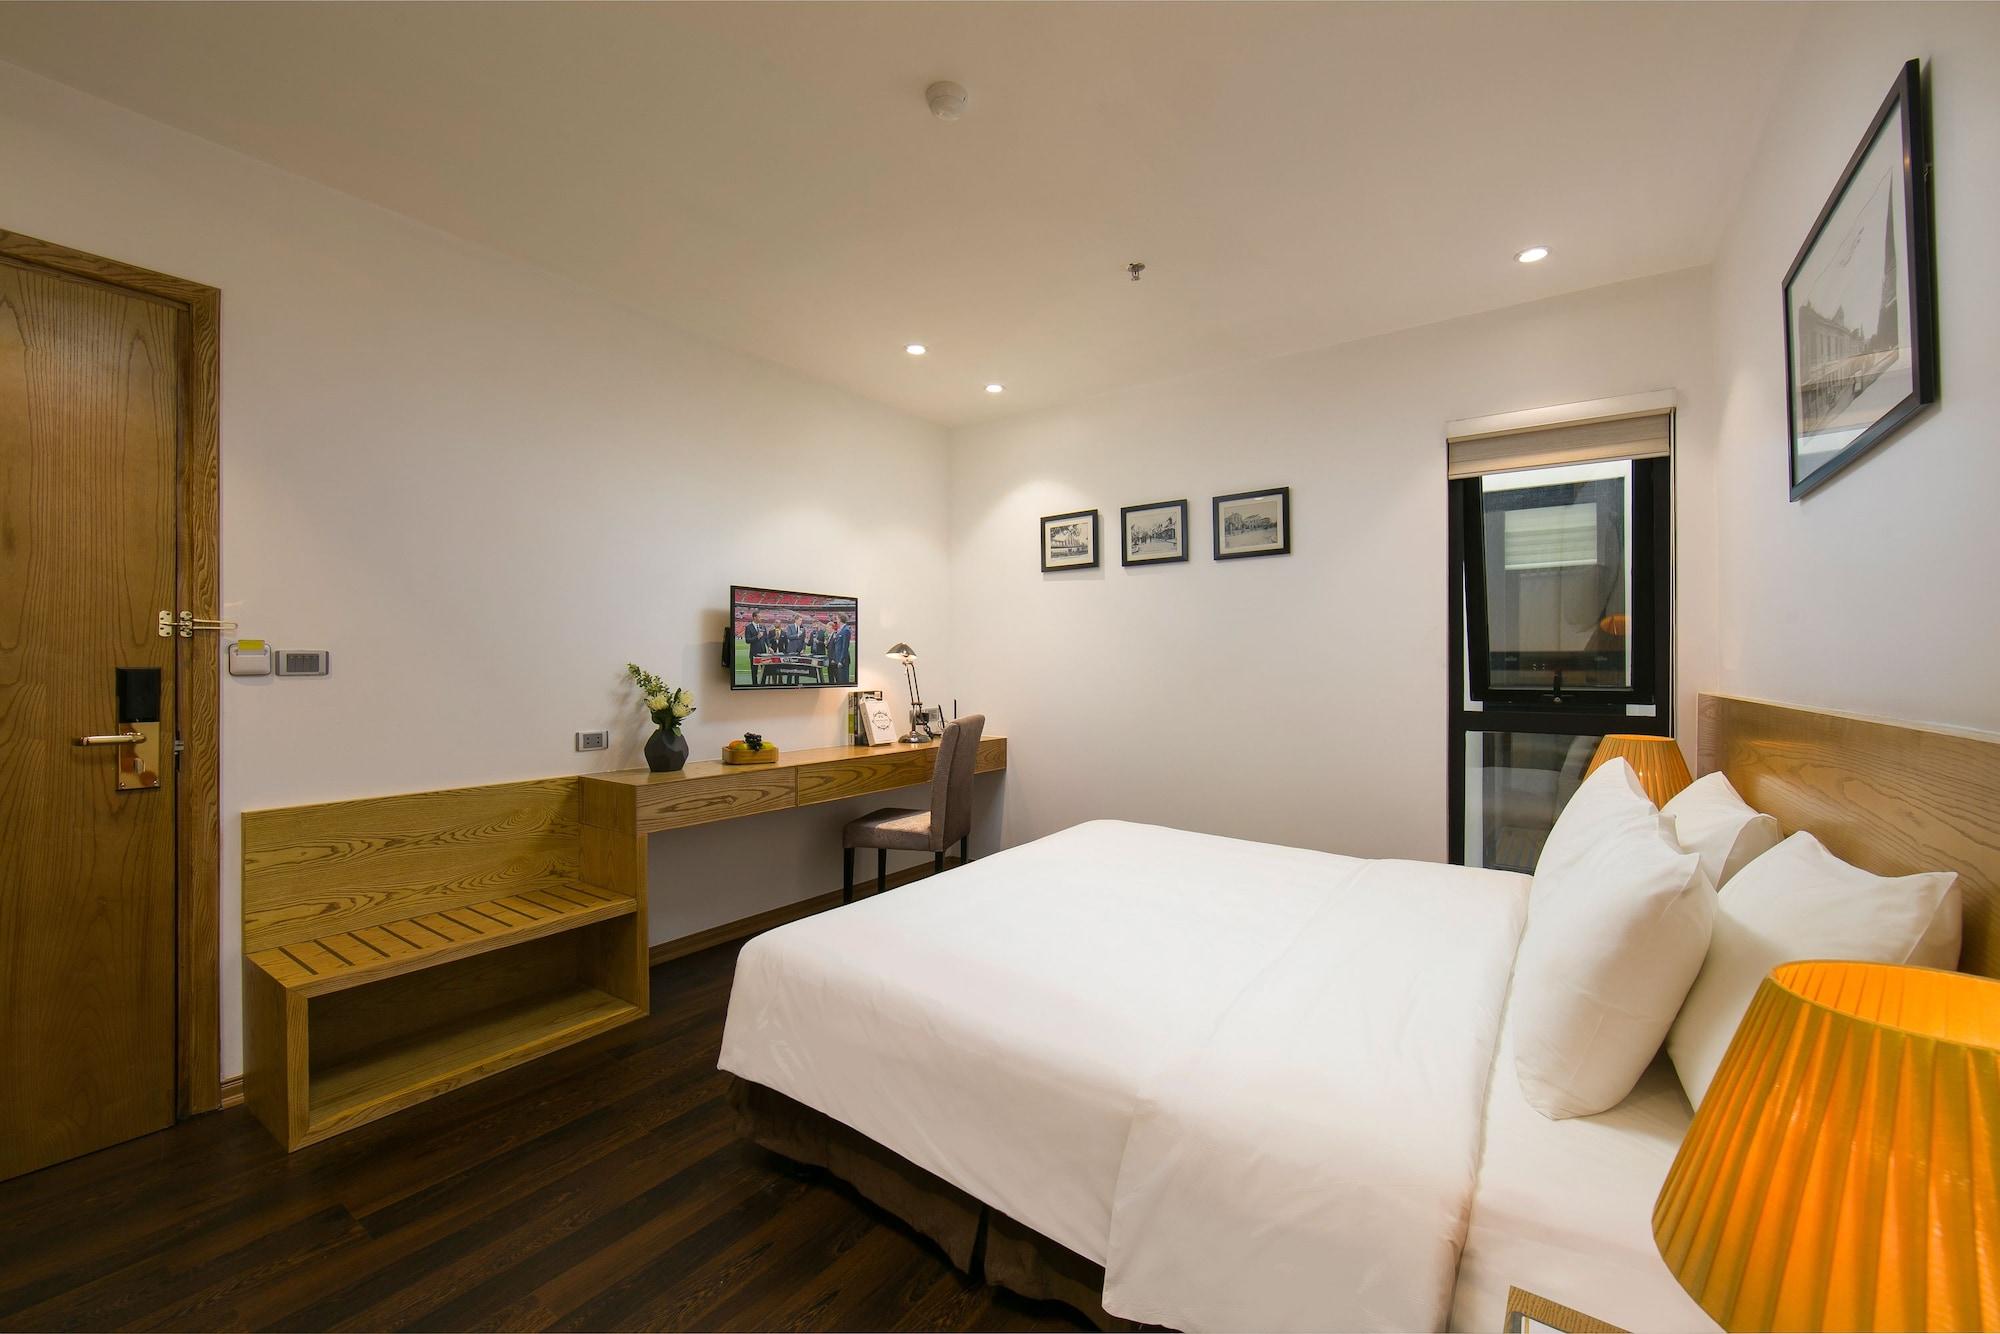 Sunline Paon Hotel, Hoàn Kiếm